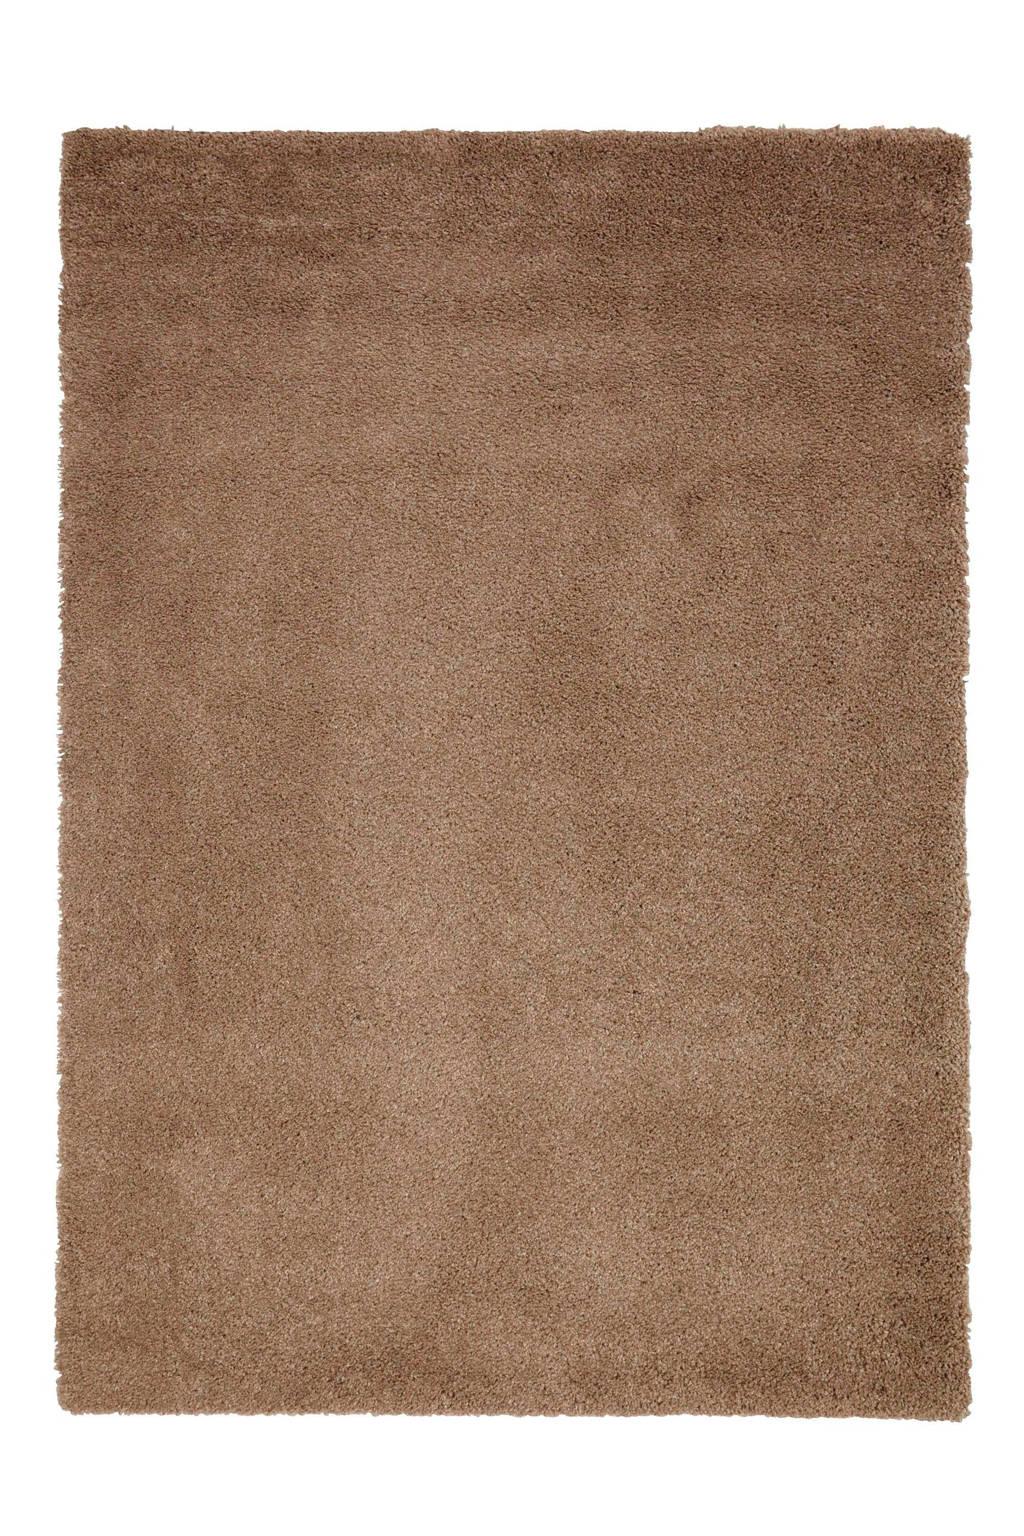 whkmp's own Vloerkleed  (290x200 cm), Taupe